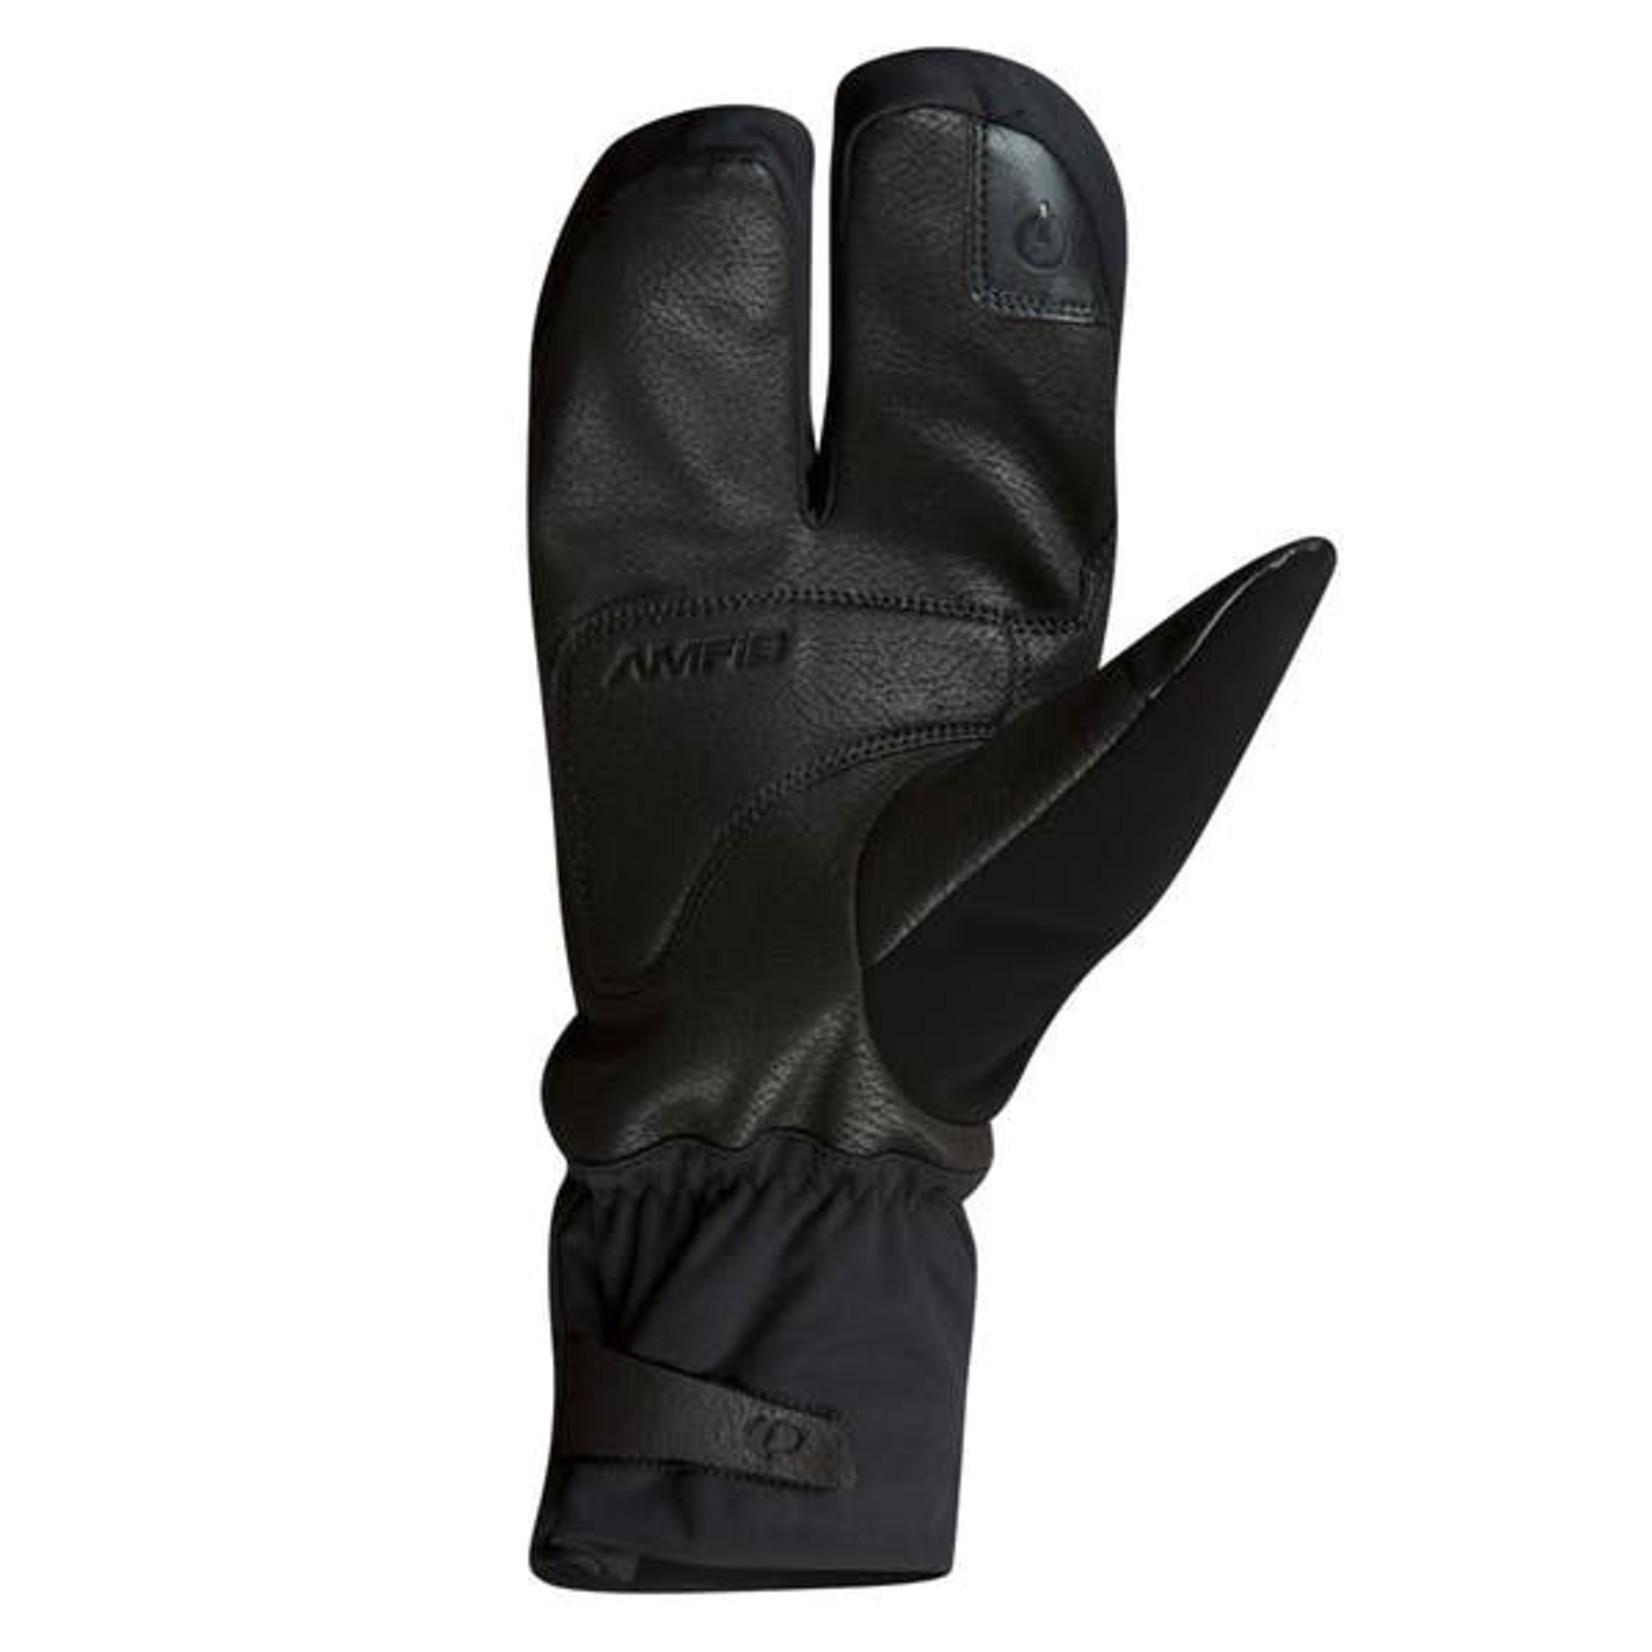 Shimano Pearl Izumi Amfib Lobster Gel Glove